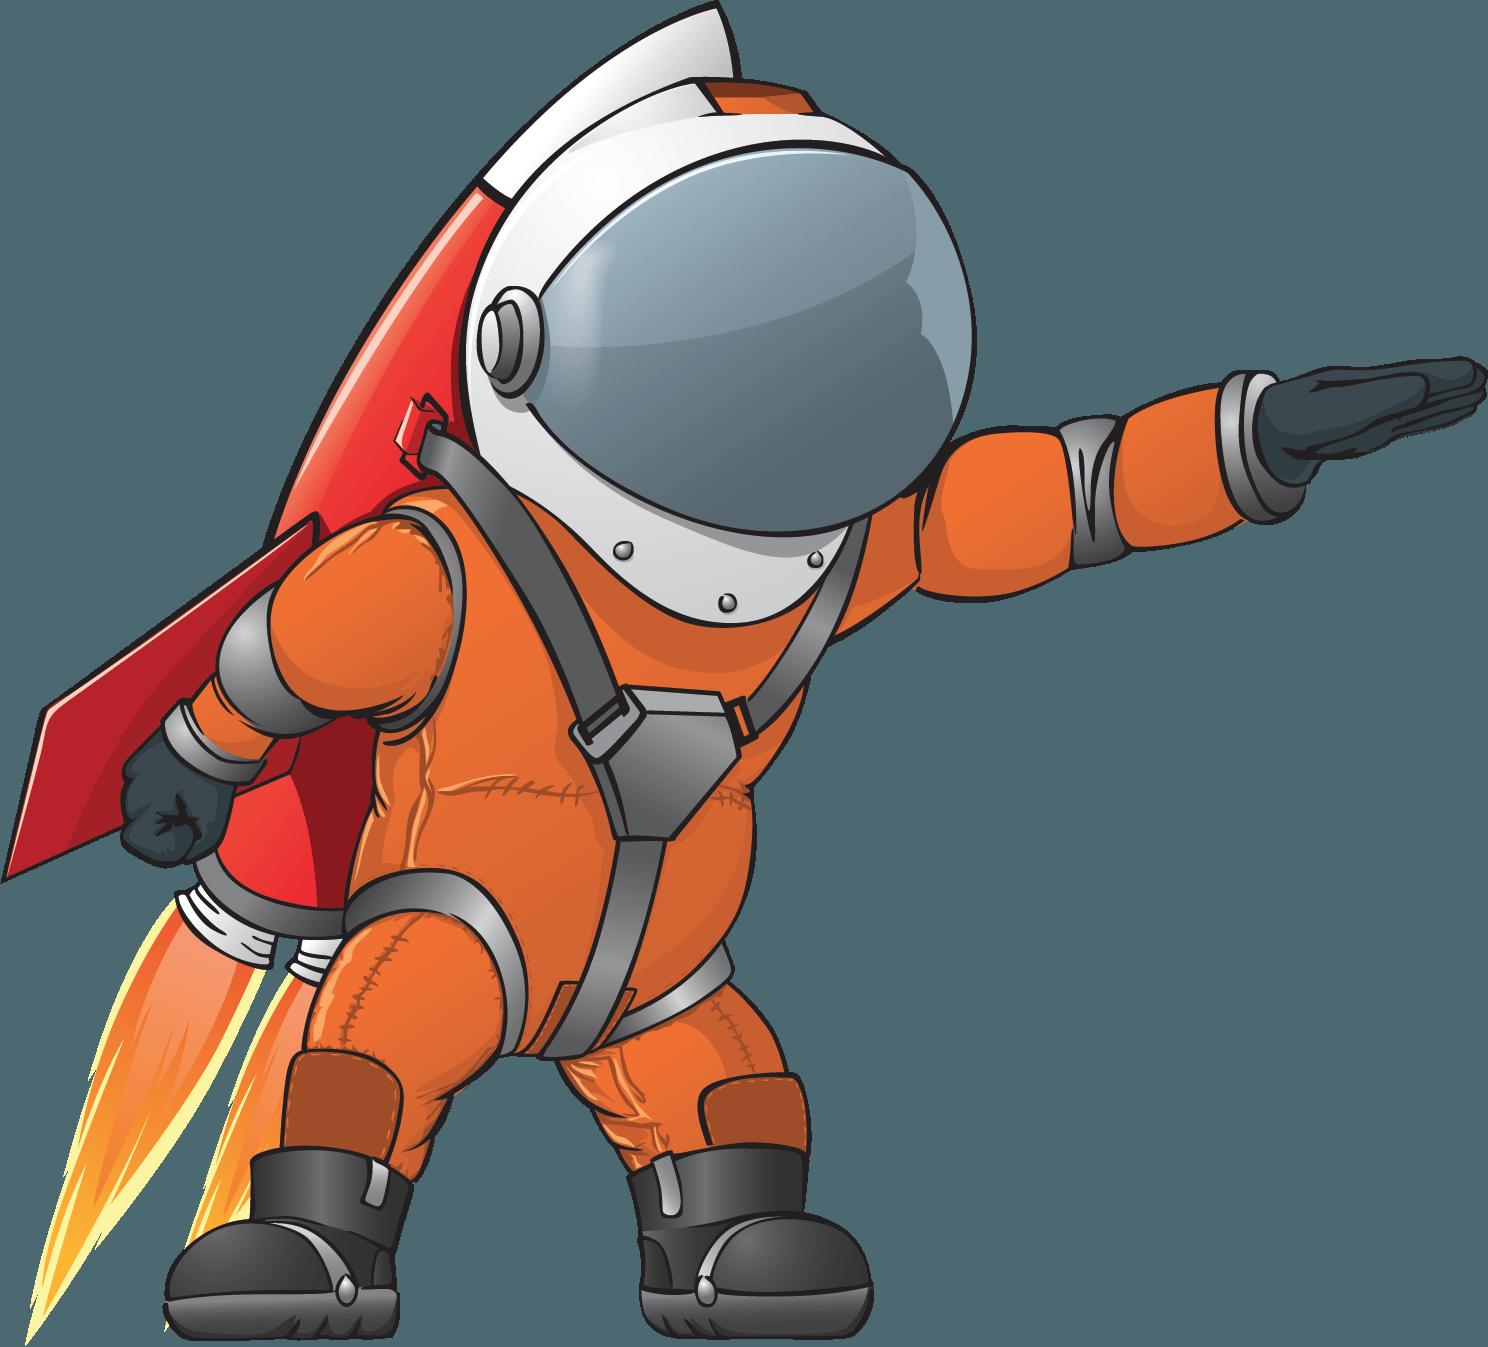 ad-words-astronaut